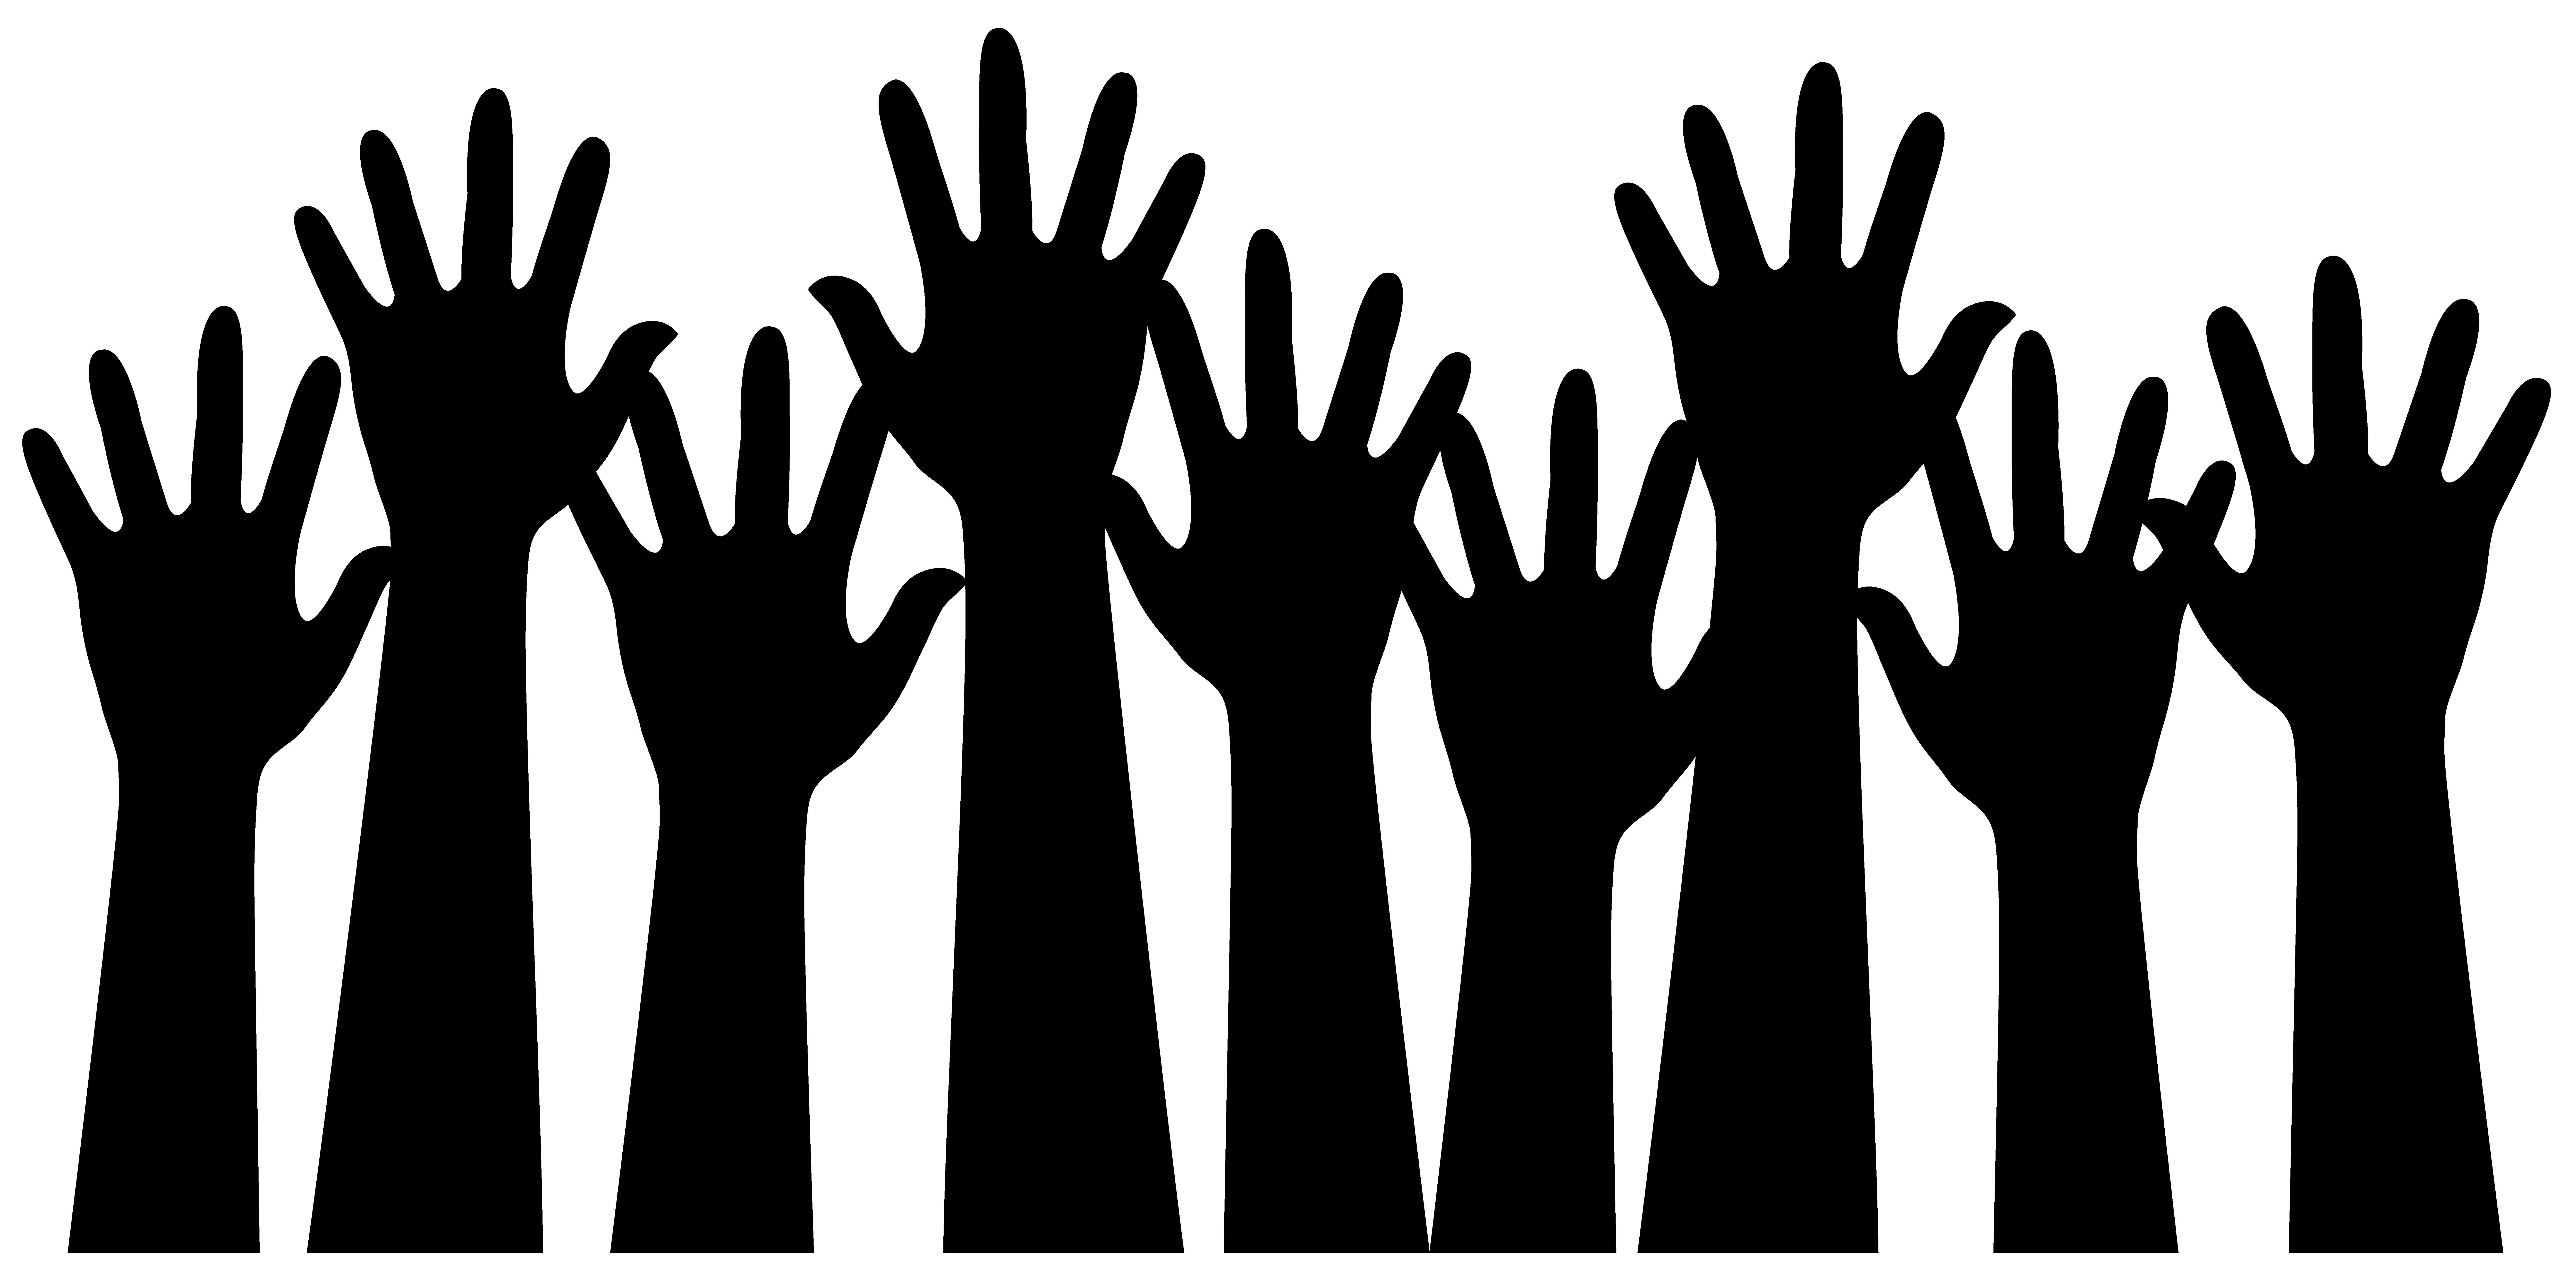 Hand reaching basketball clipart clip art download hands_silhouettes.png 11.059 × 5.489 pixels | Stencils | Pinterest ... clip art download